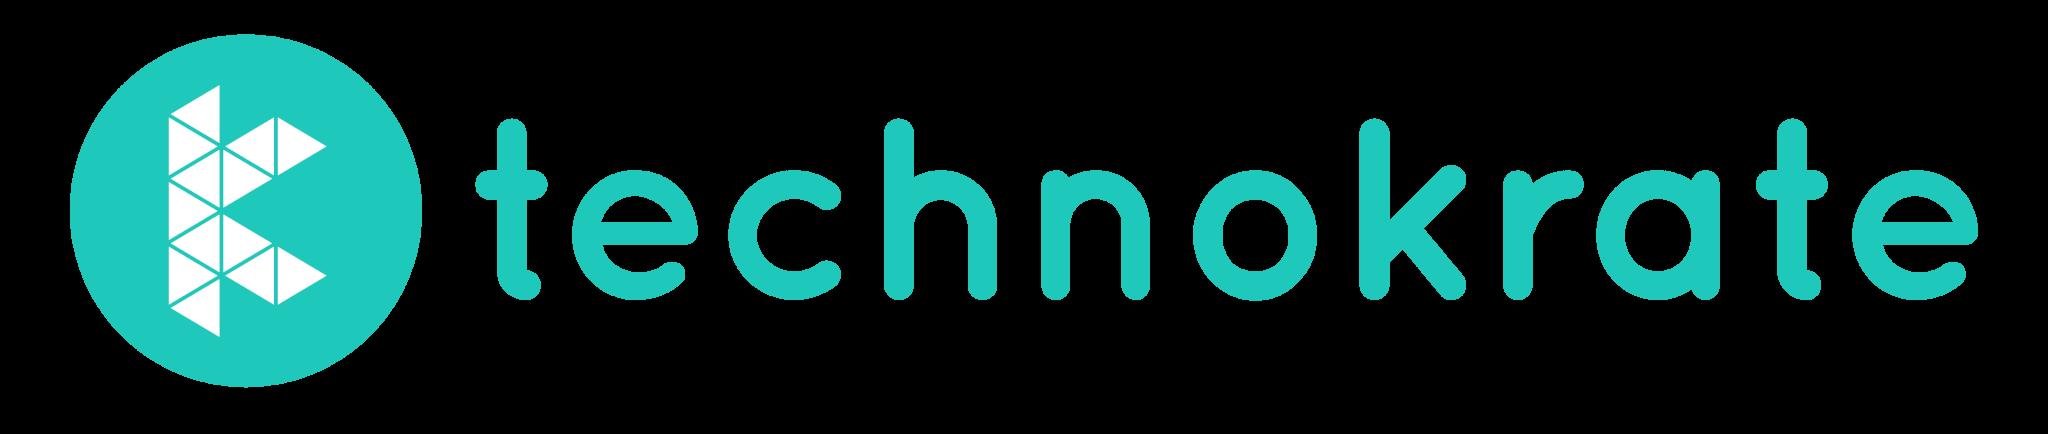 Technokrate